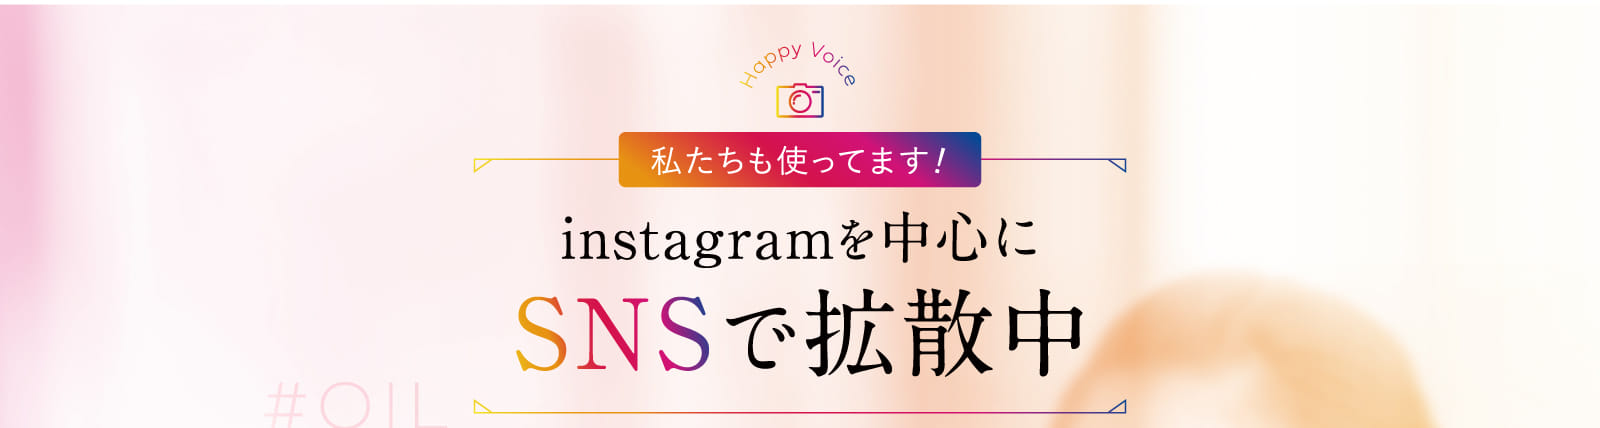 instagramを中心にSNSで拡散中